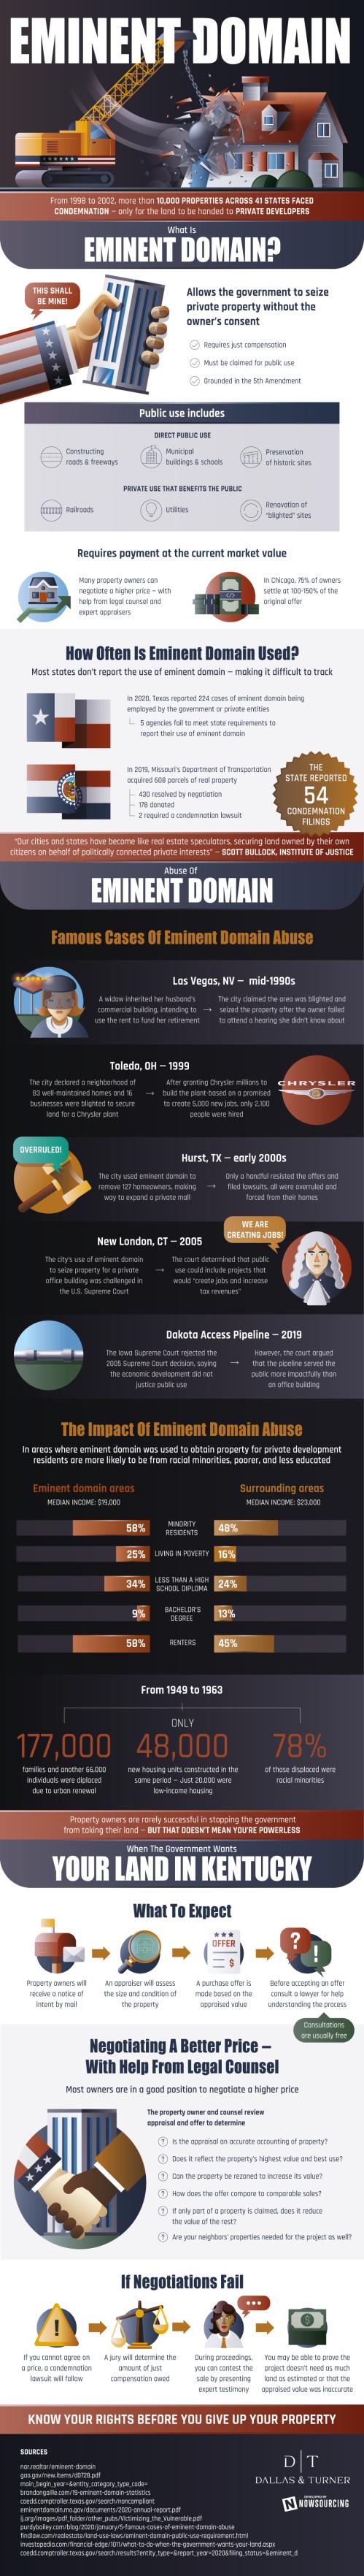 eminent domain infographic